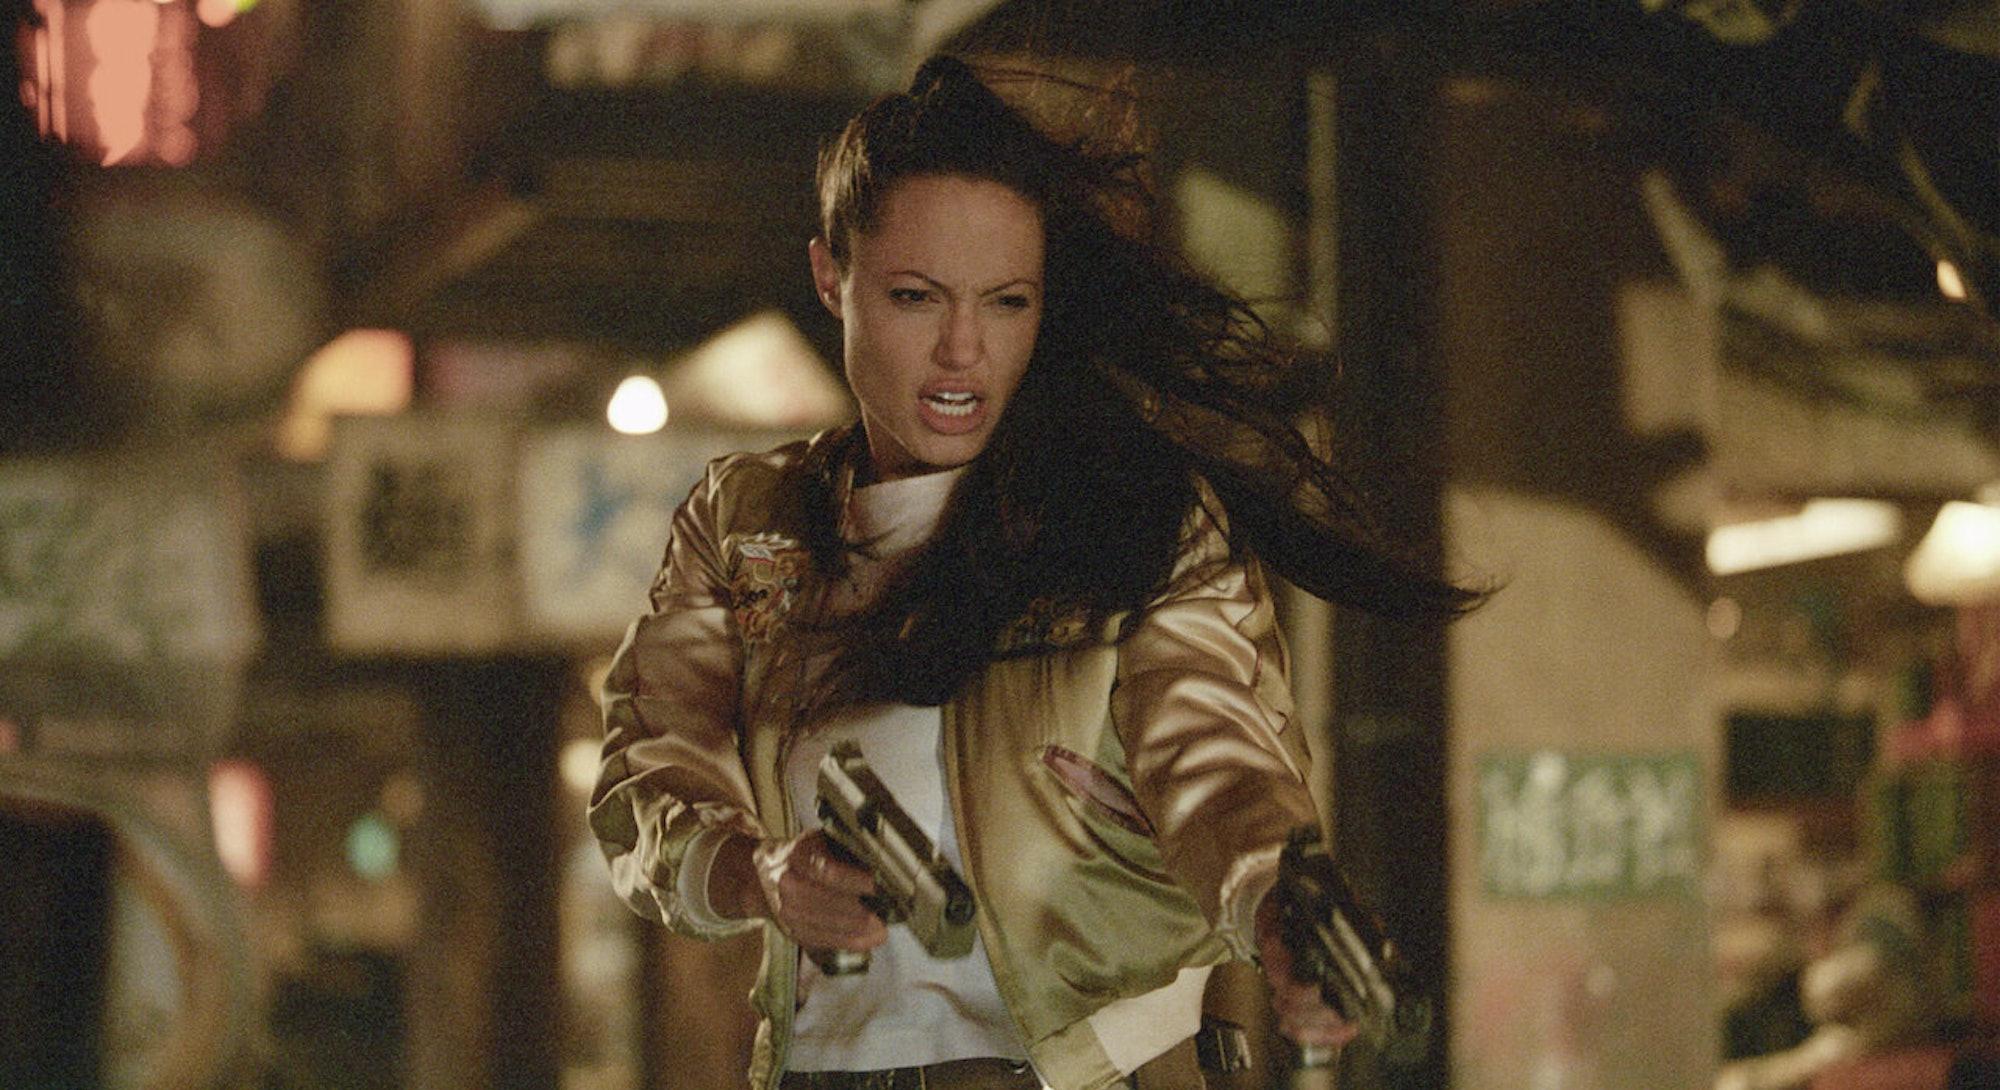 Angelina Jolie in screenshot from Lara Croft Tomb Raider The Cradle of Life movie